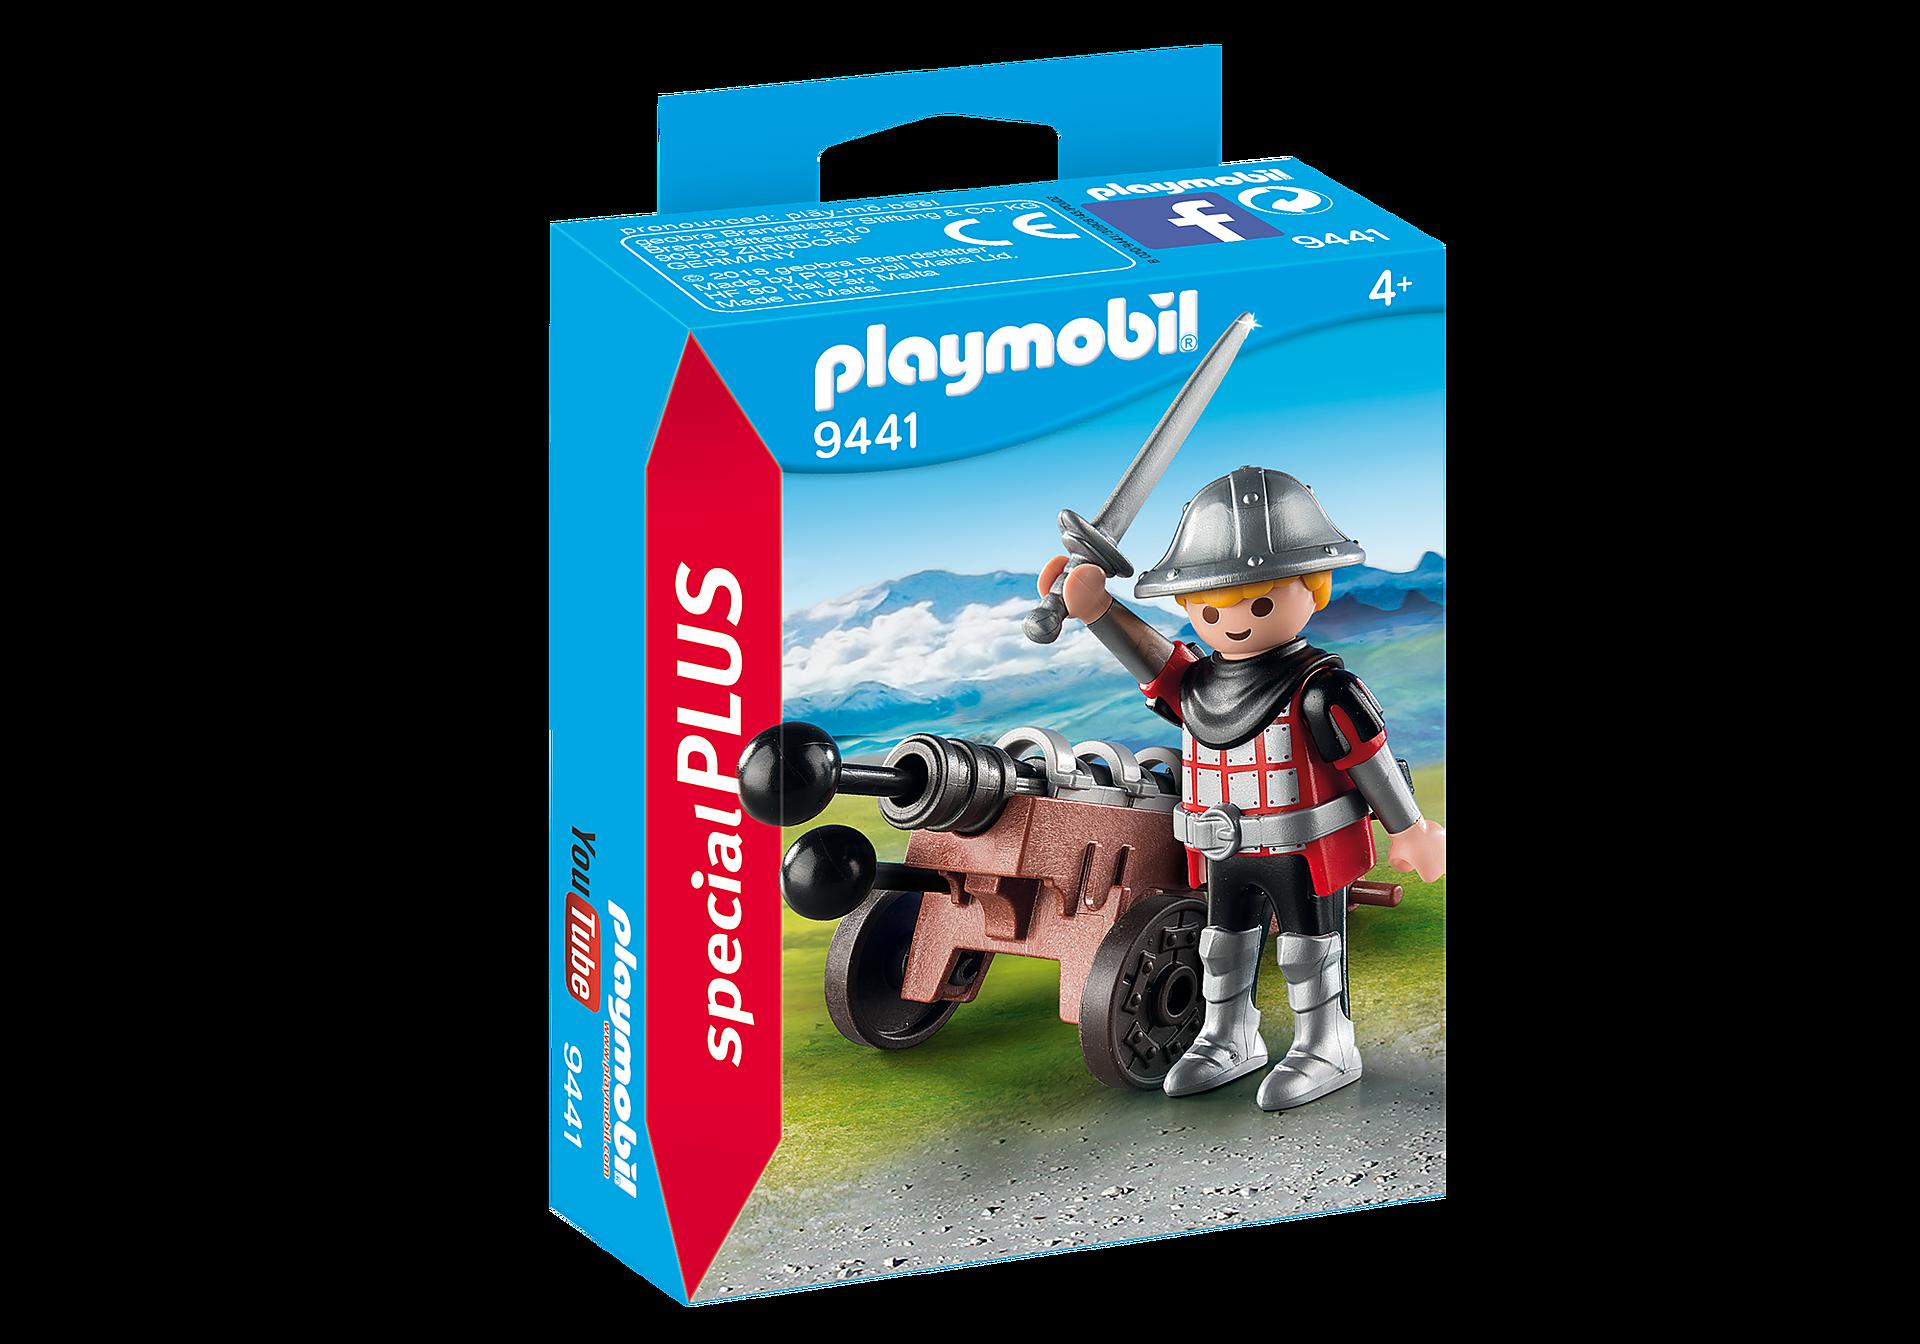 http://media.playmobil.com/i/playmobil/9441_product_box_front/Rycerz z armatą